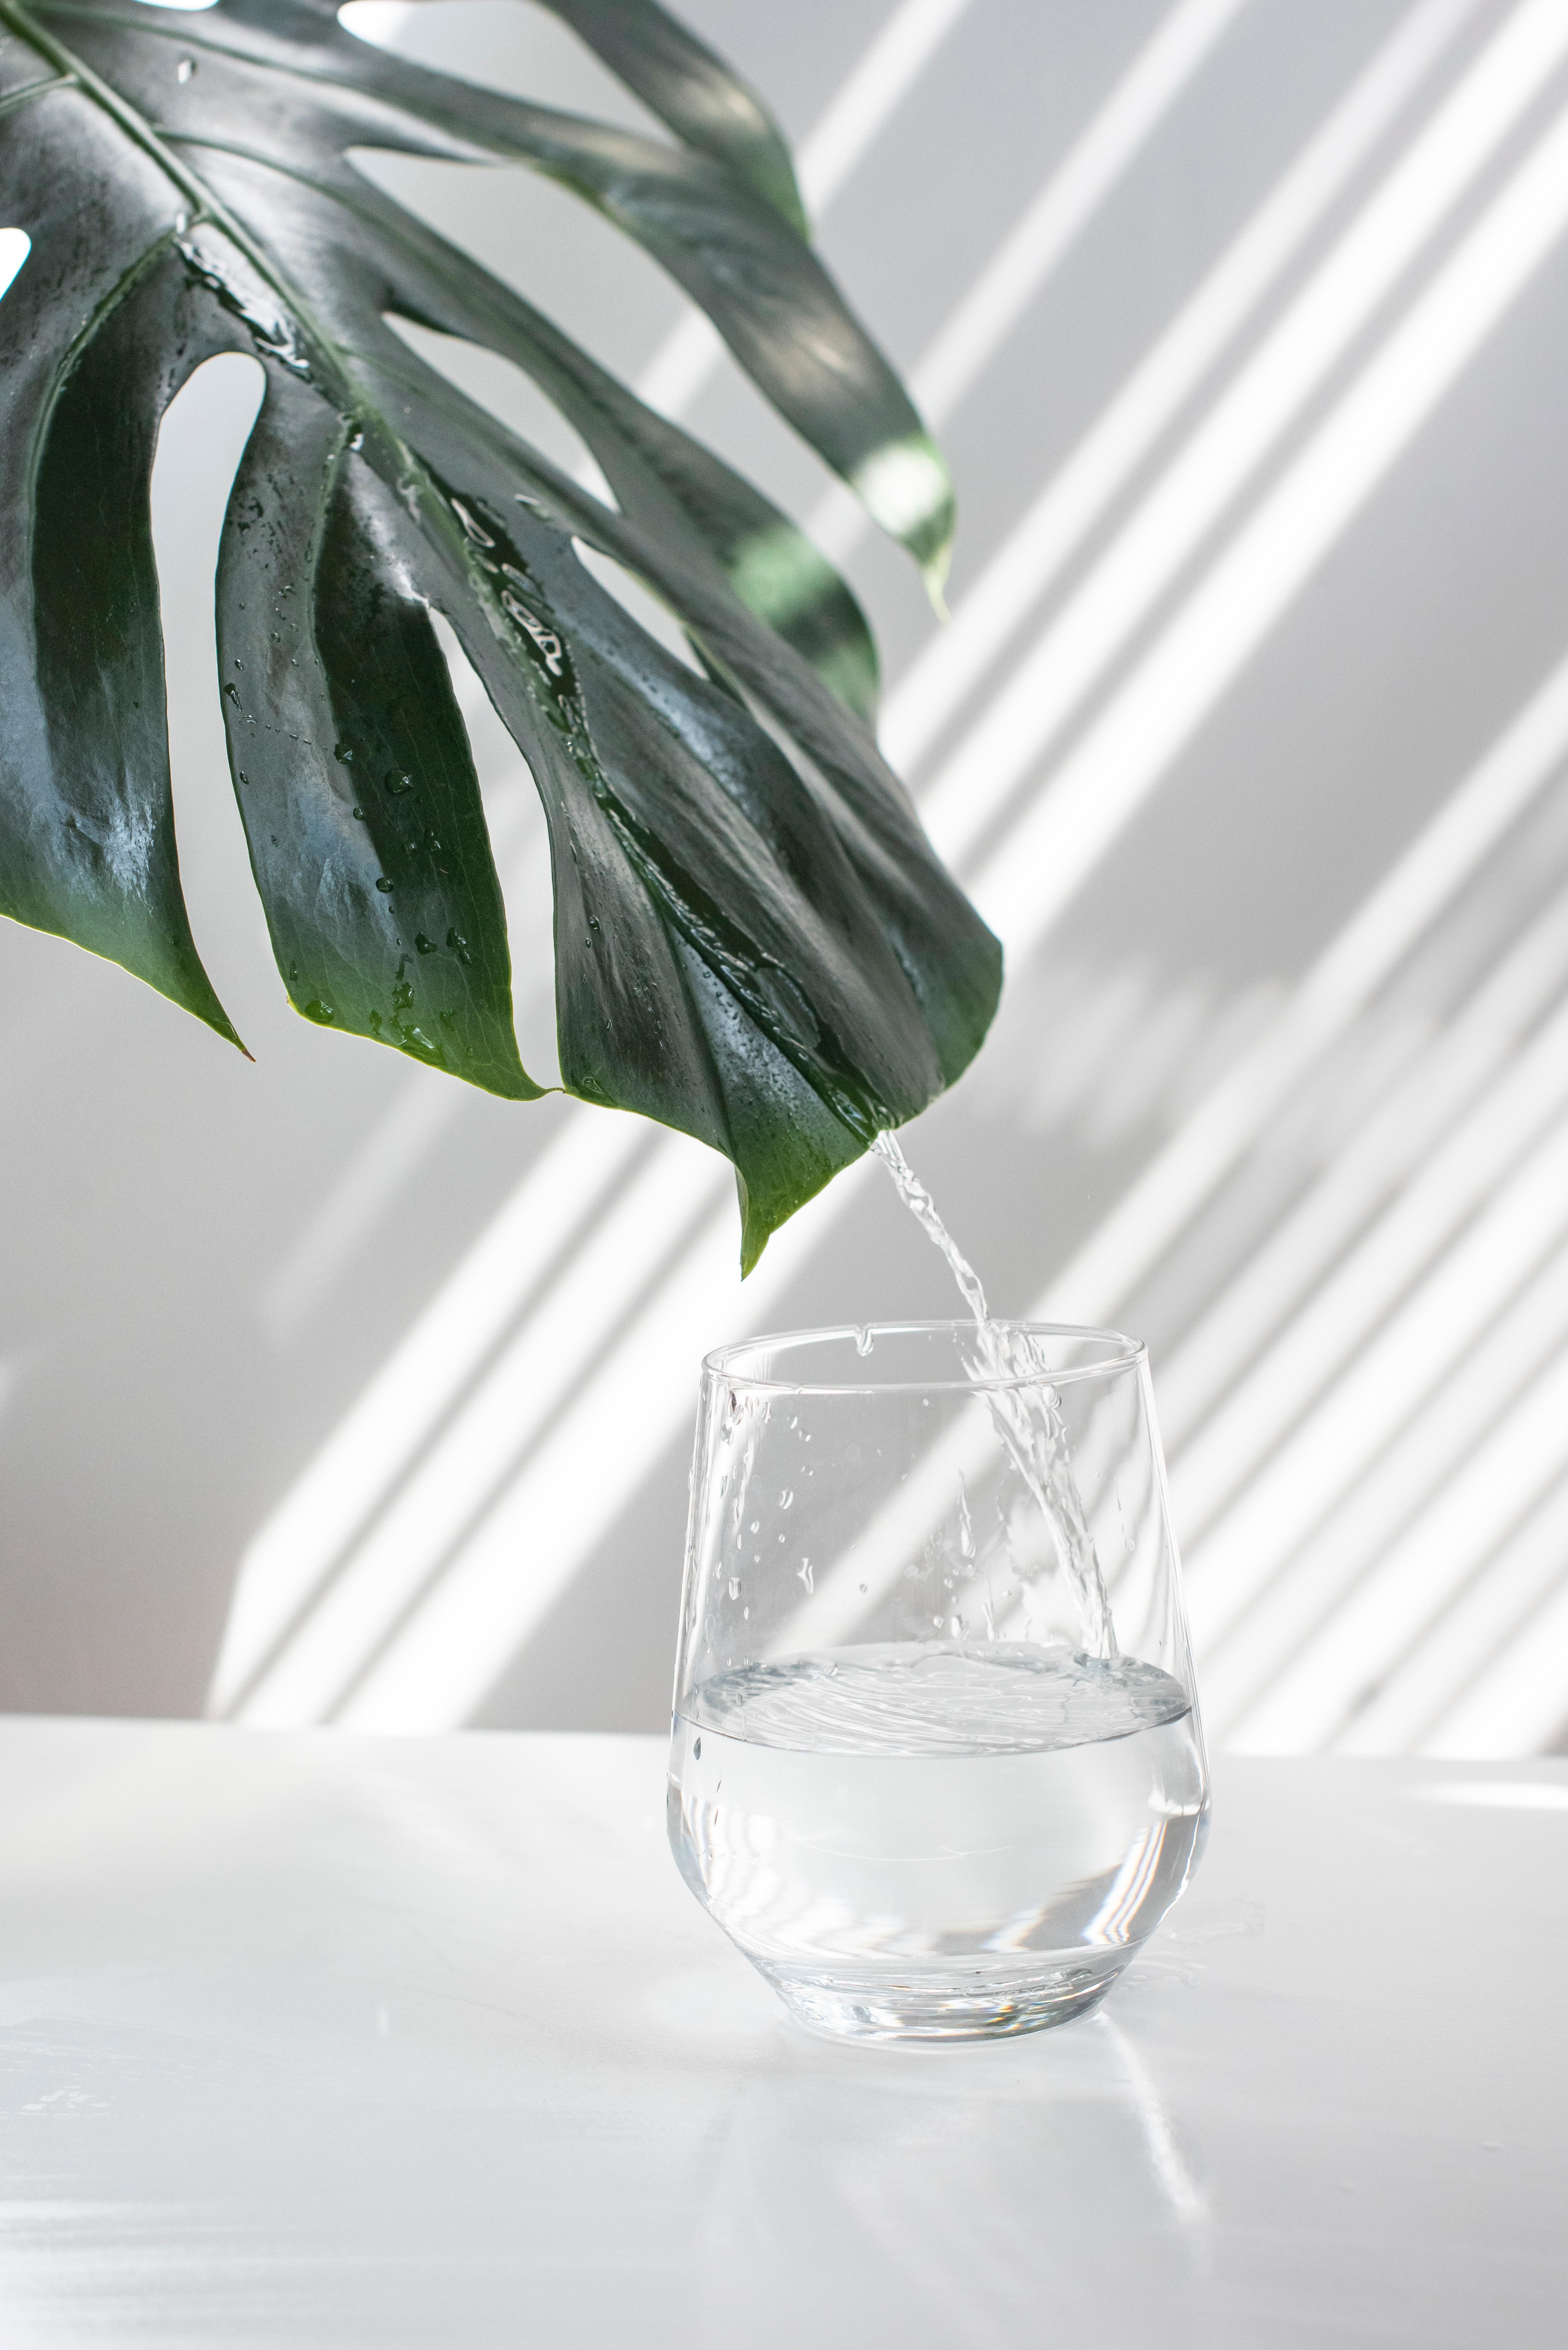 Can Fridge Filters Remove Fluoride?